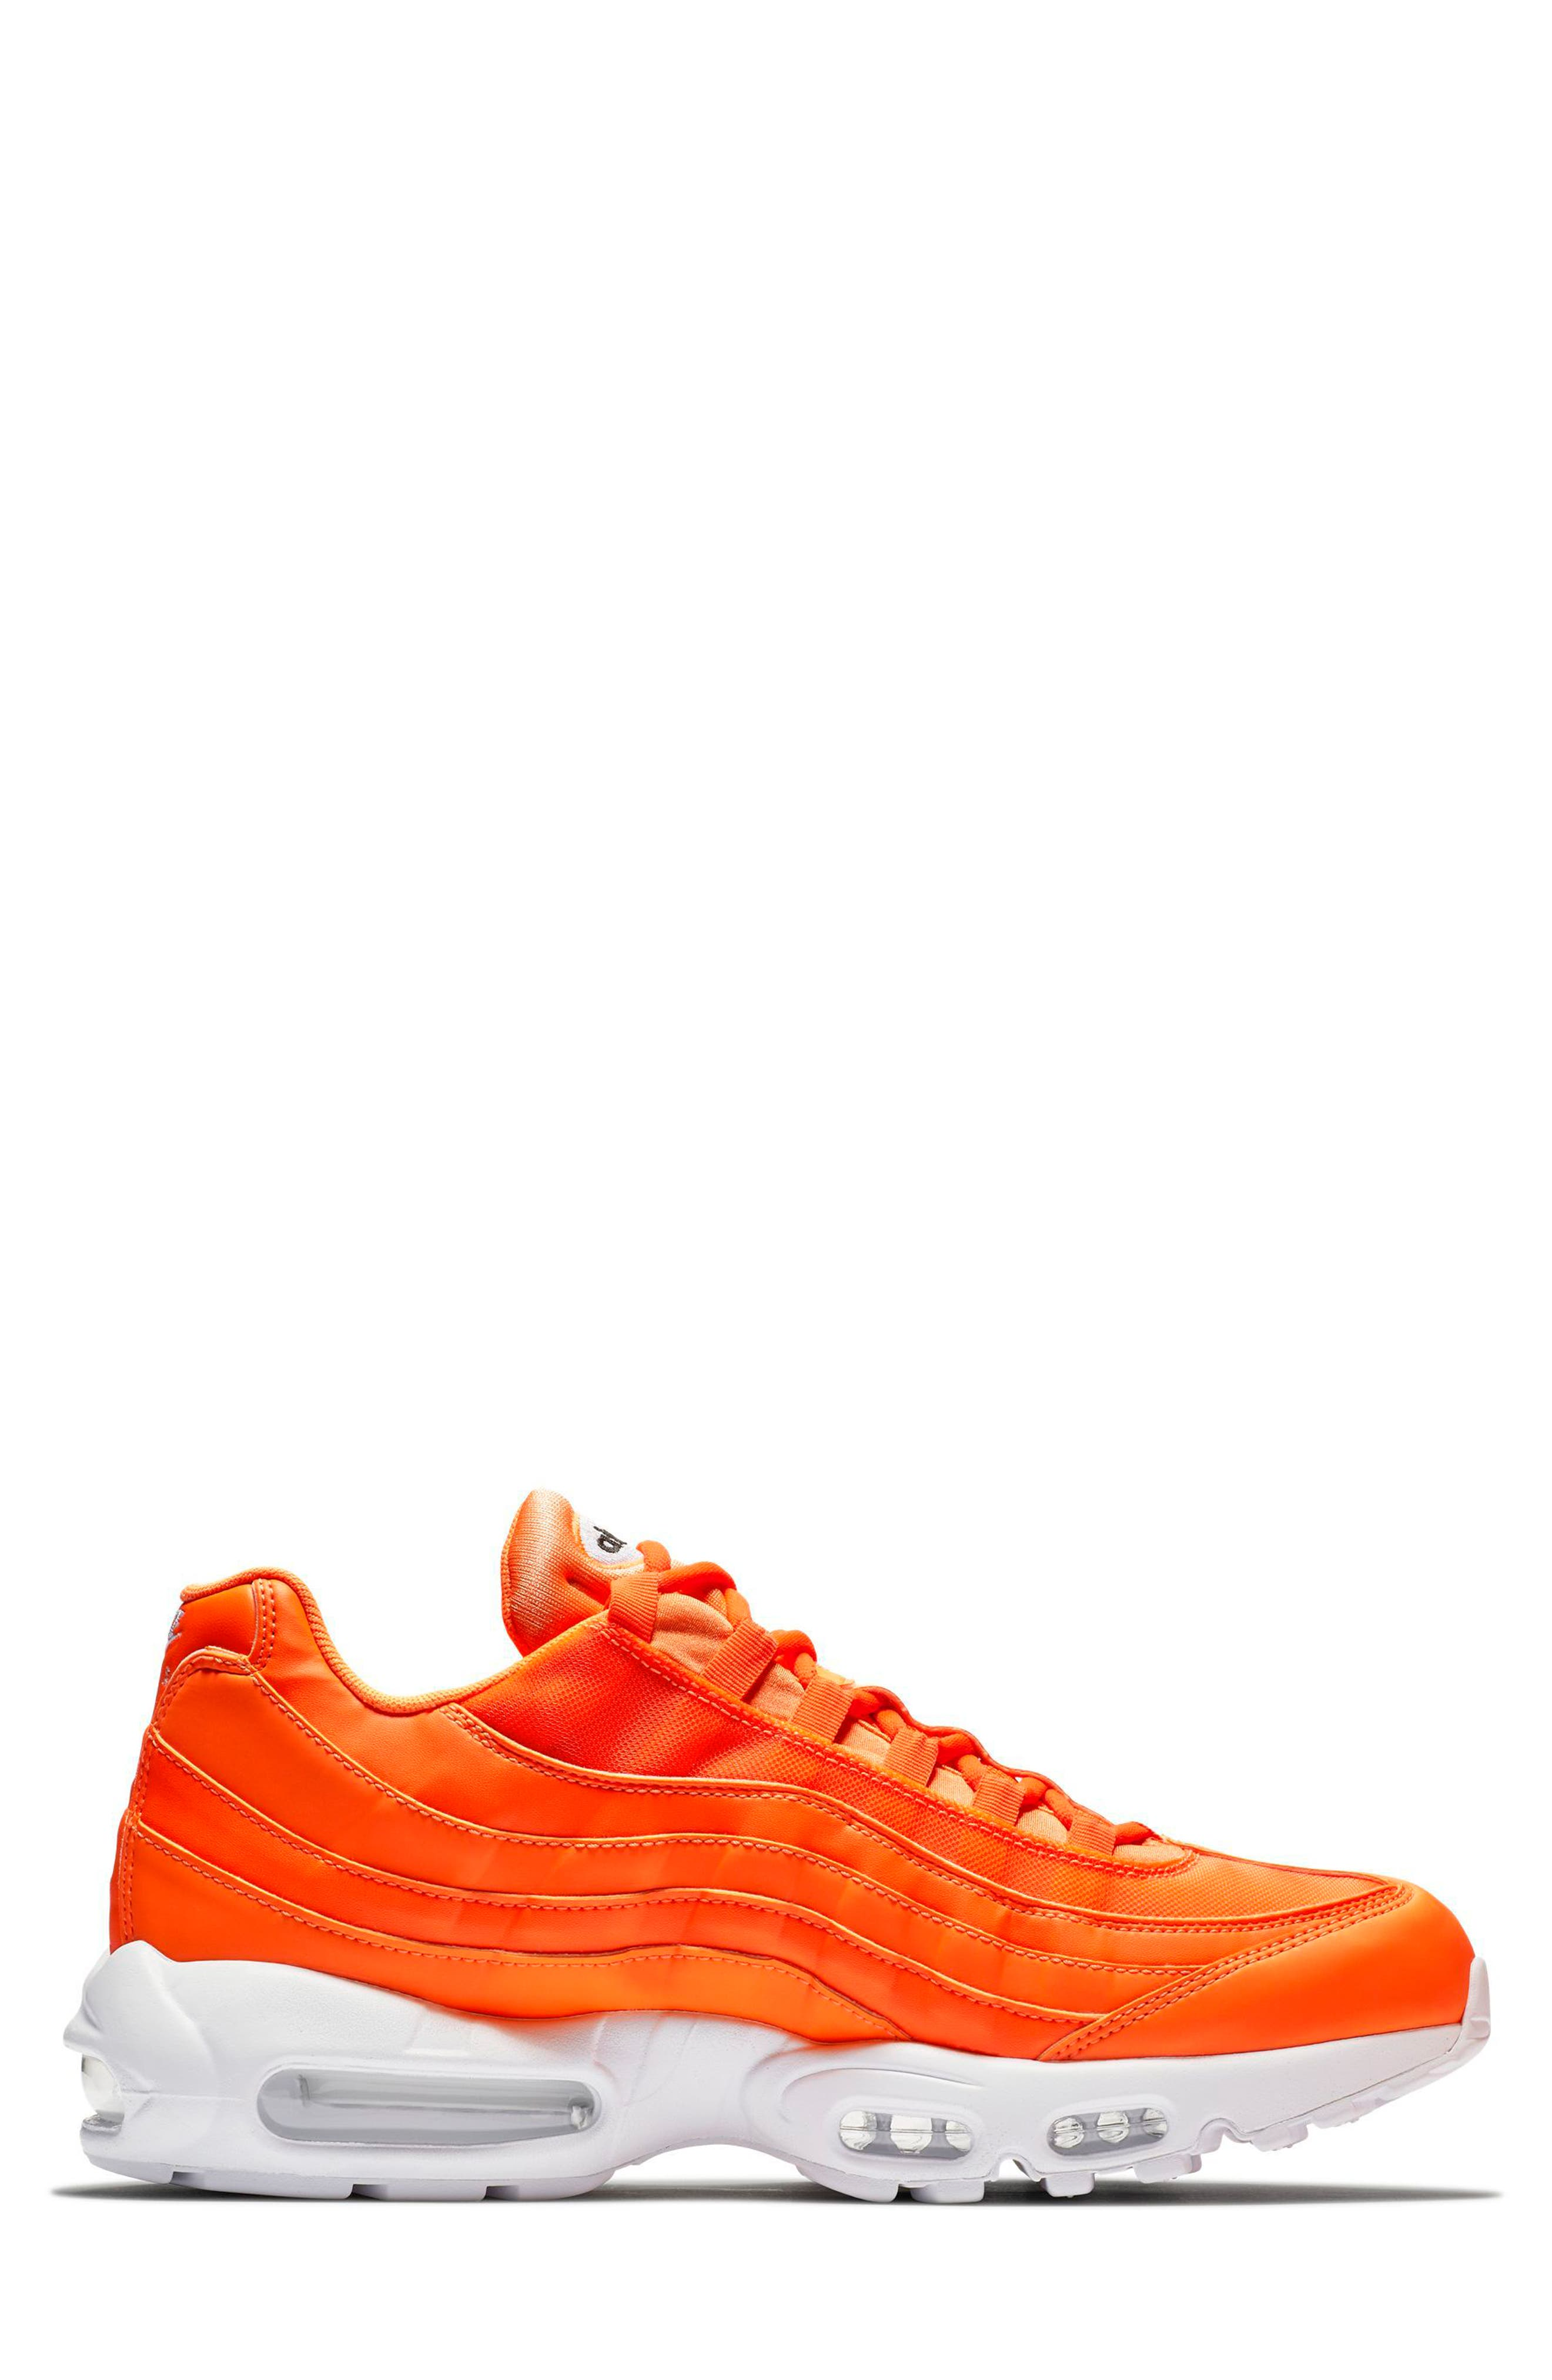 Air Max 95 SE Running Shoe,                             Alternate thumbnail 3, color,                             ORANGE/ WHT-BLK